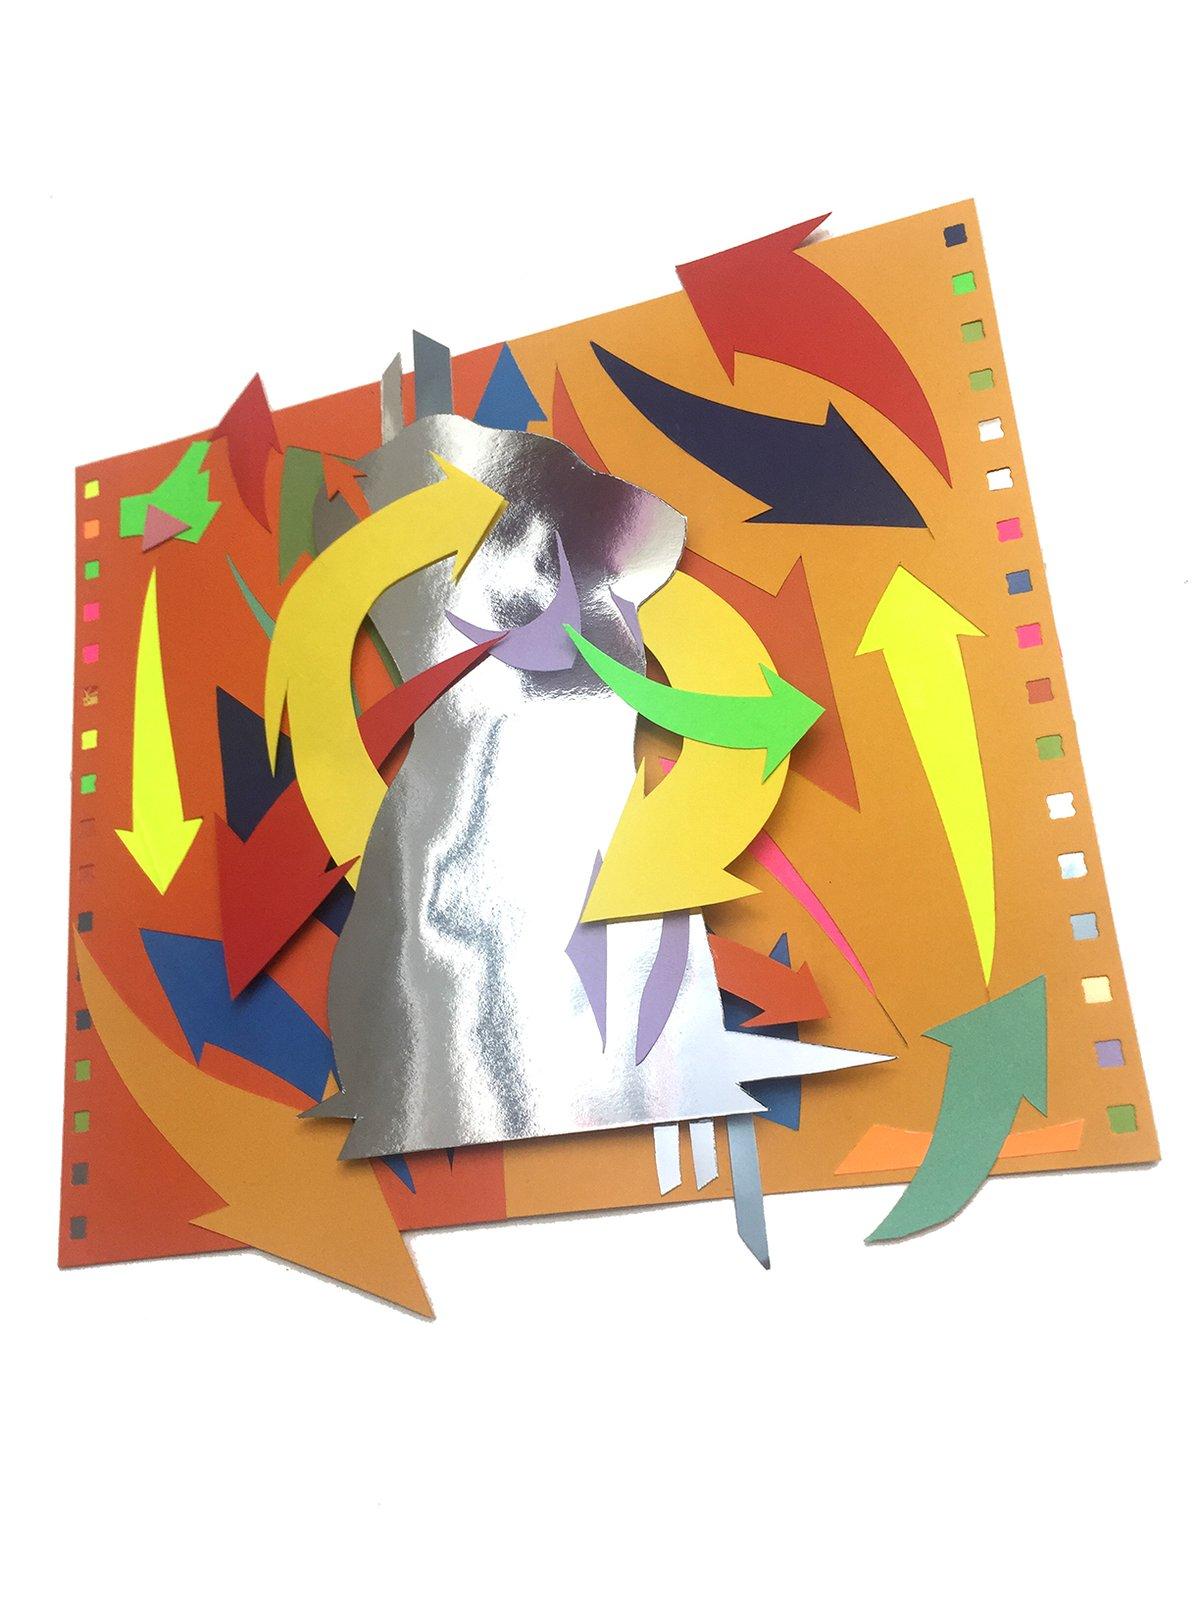 Image of 3D TORSO COLLAGE. 2020.